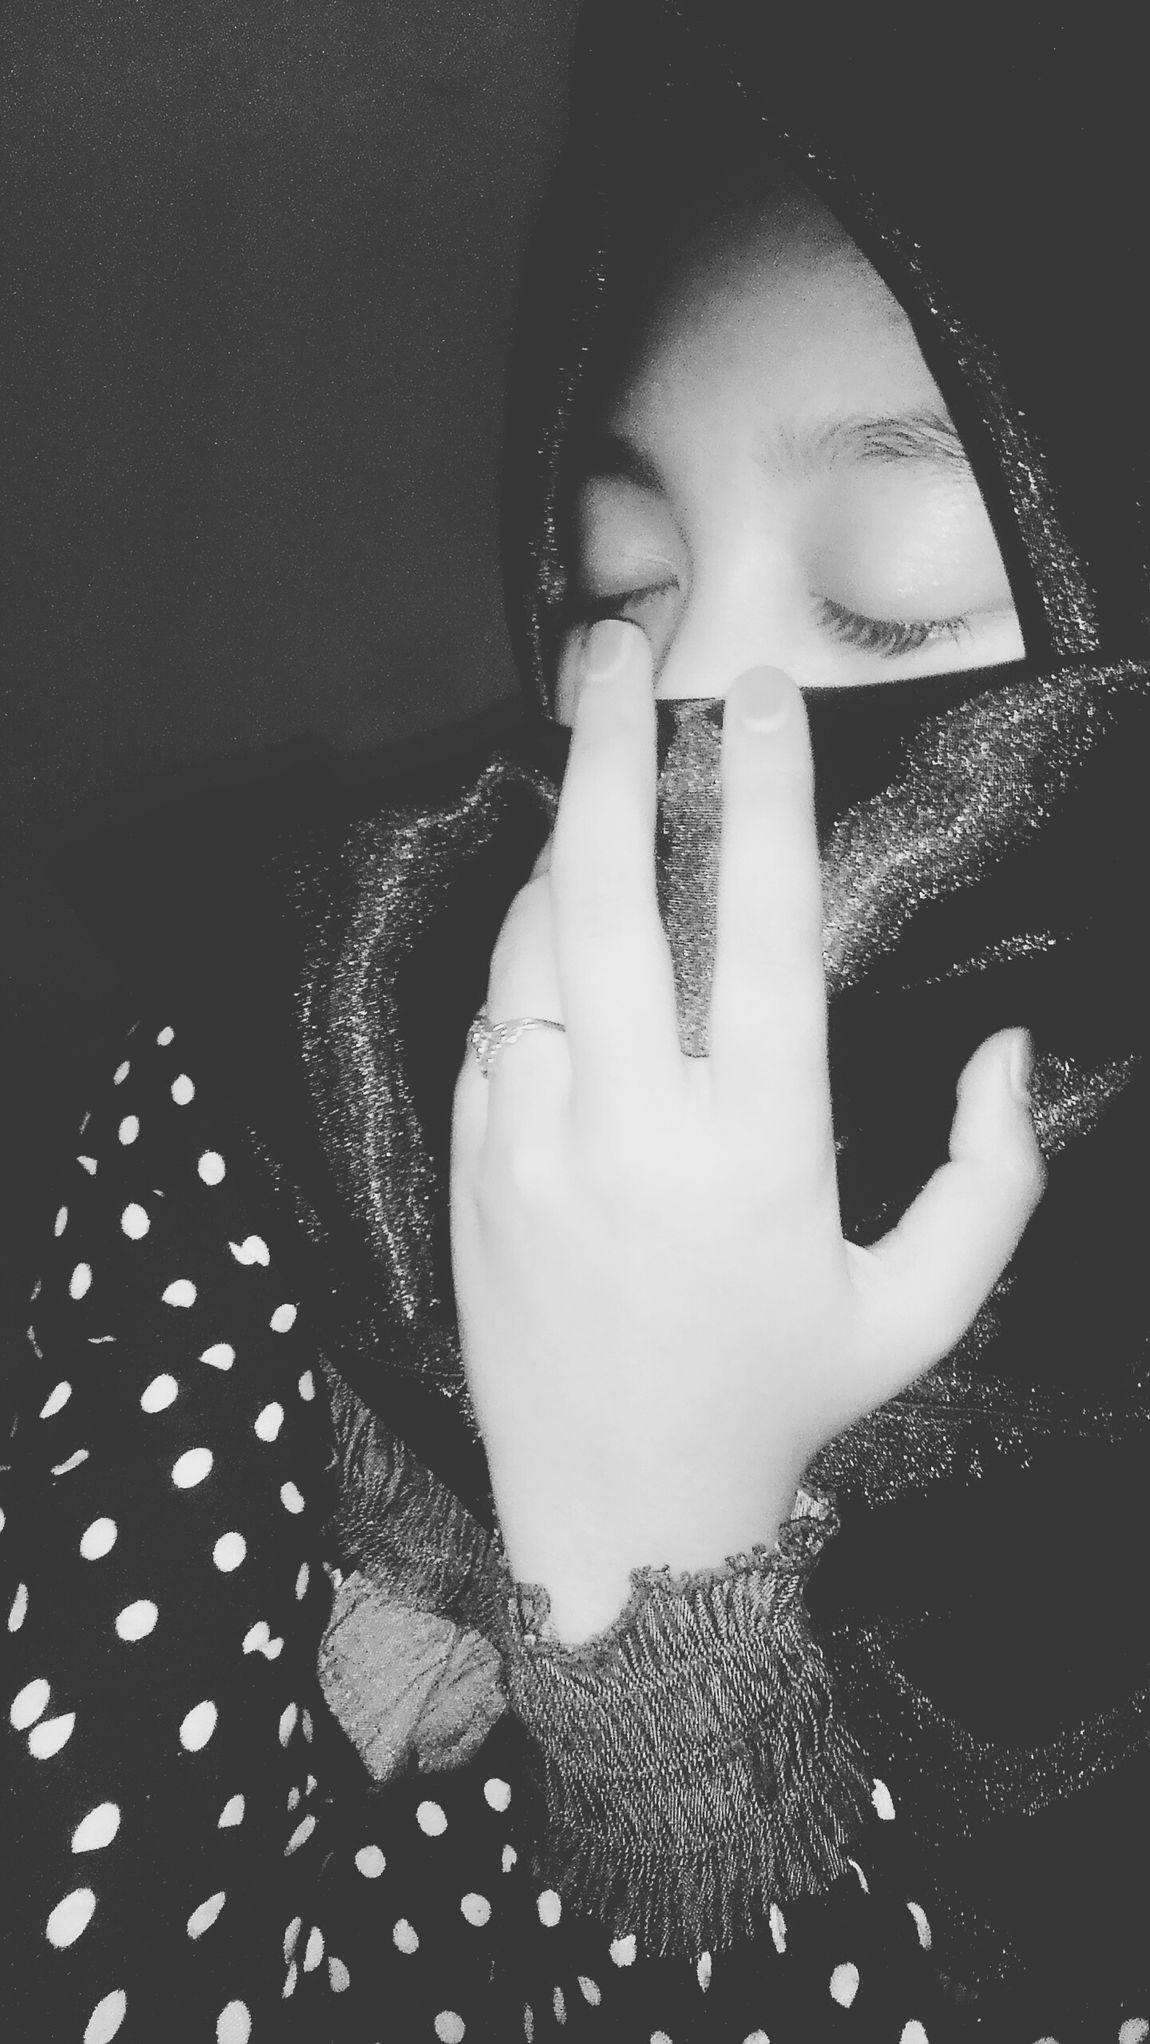 Selama menutup mata masih membuatku tenang aku akan selalu melakukannya 😊😊😊 Keep Smile Sohappy😁😄 Populer Enjoying Life First Eyeem Photo Staystrong Abigthankyou Felling Good  NotBad BeliveInYourDreams